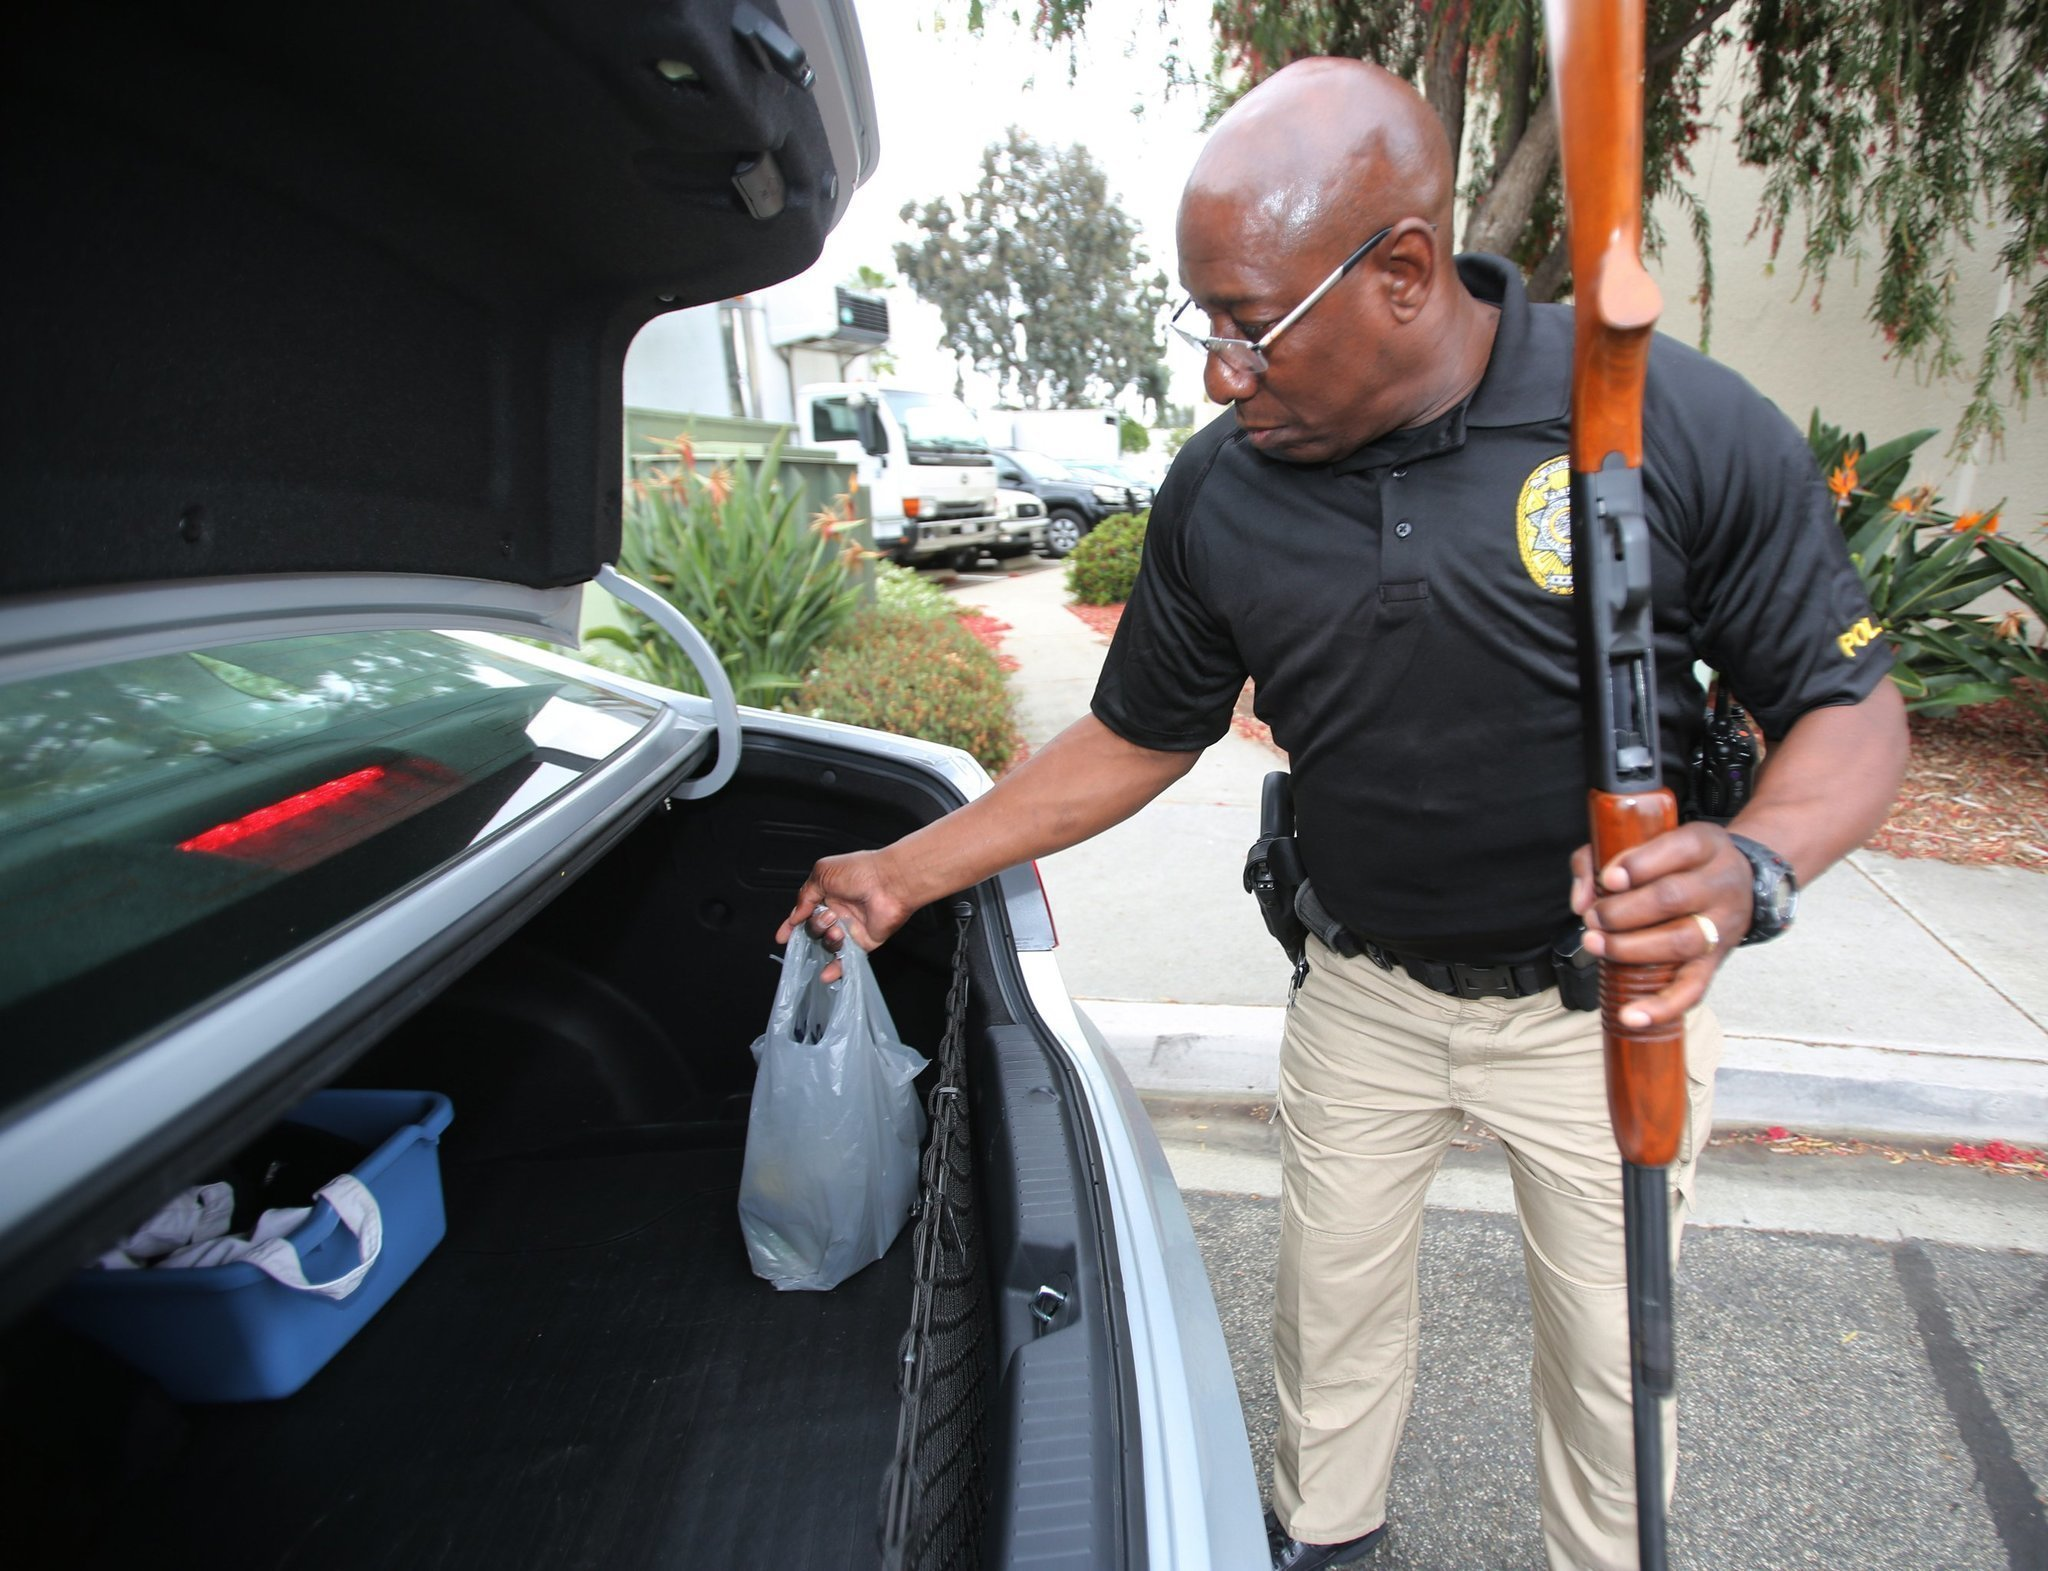 Gun buyback nets 210 firearms - The San Diego Union-Tribune